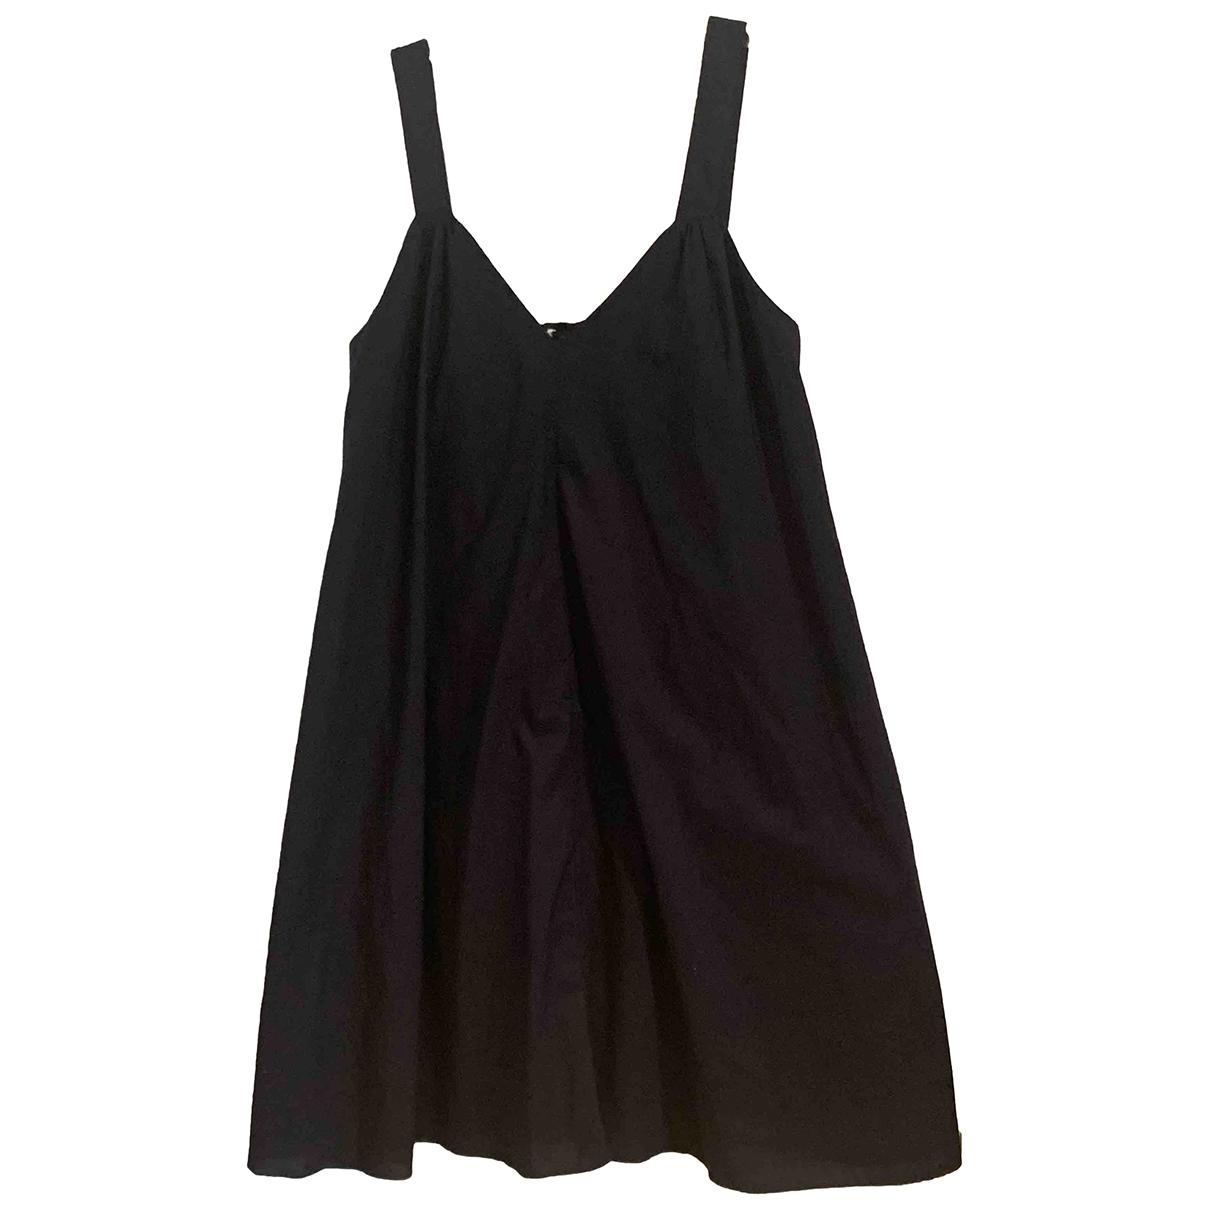 Cos \N Navy Cotton dress for Women S International